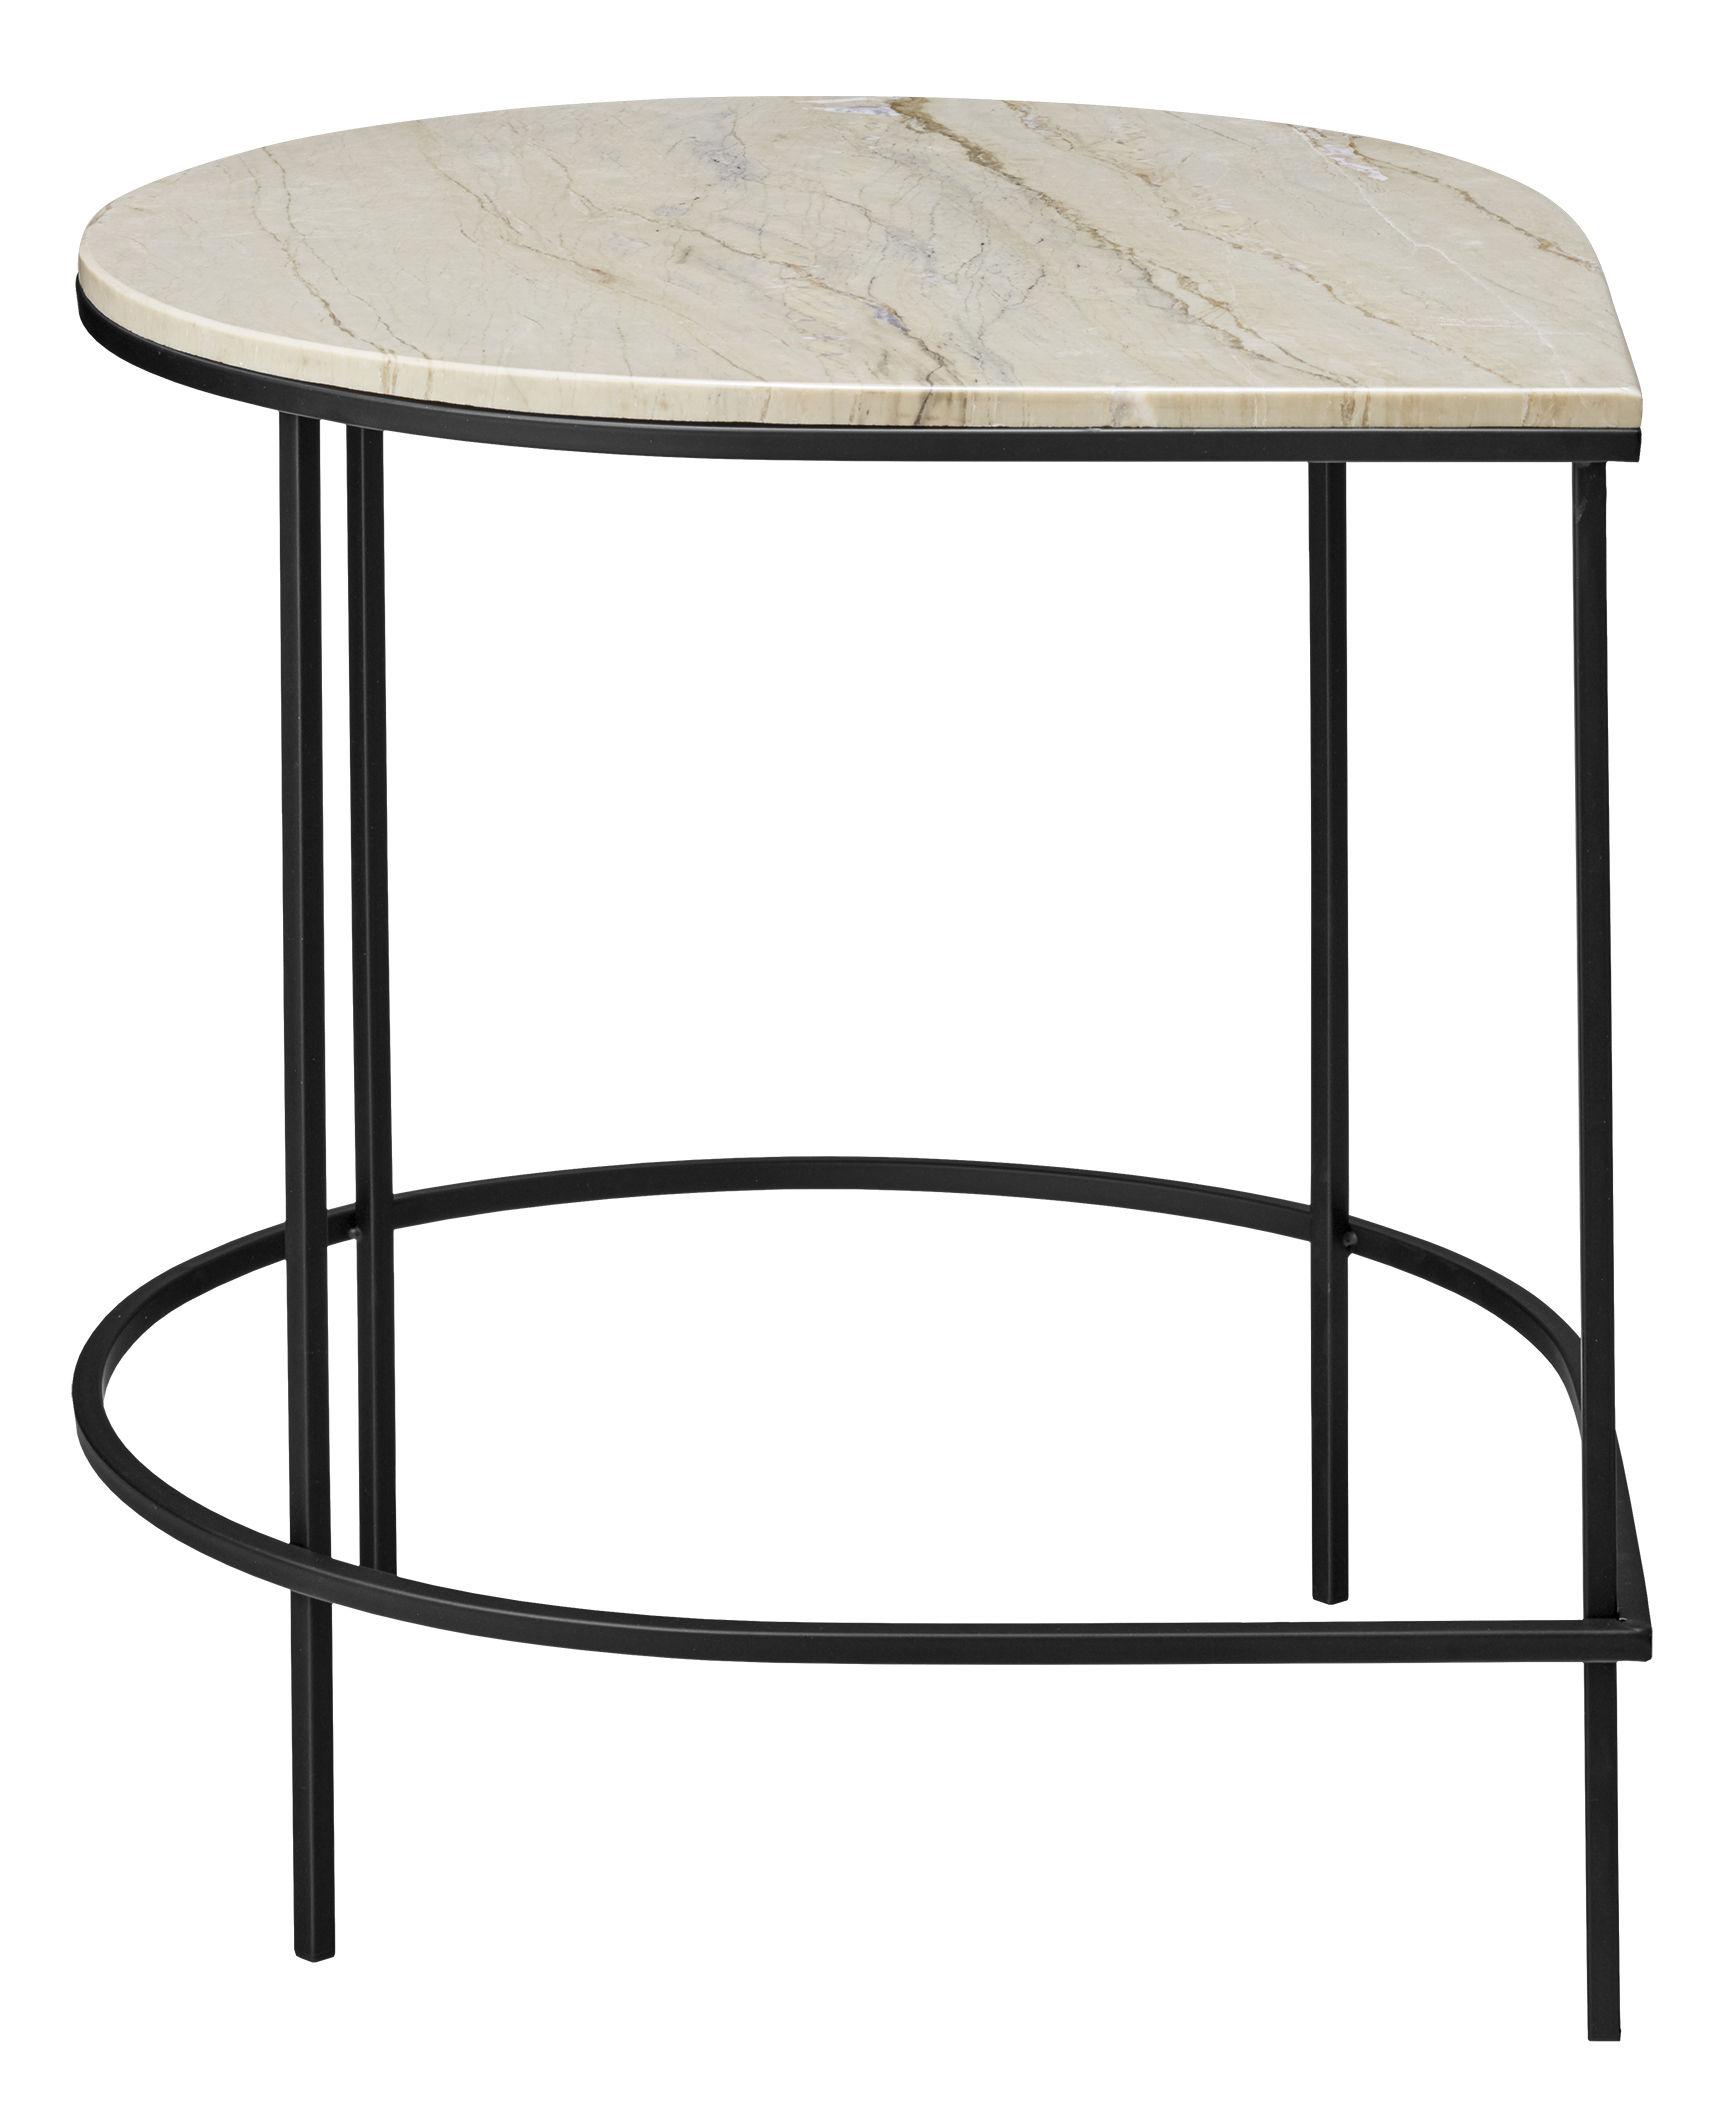 table d 39 appoint stilla plateau marbre h 50 cm marbre. Black Bedroom Furniture Sets. Home Design Ideas